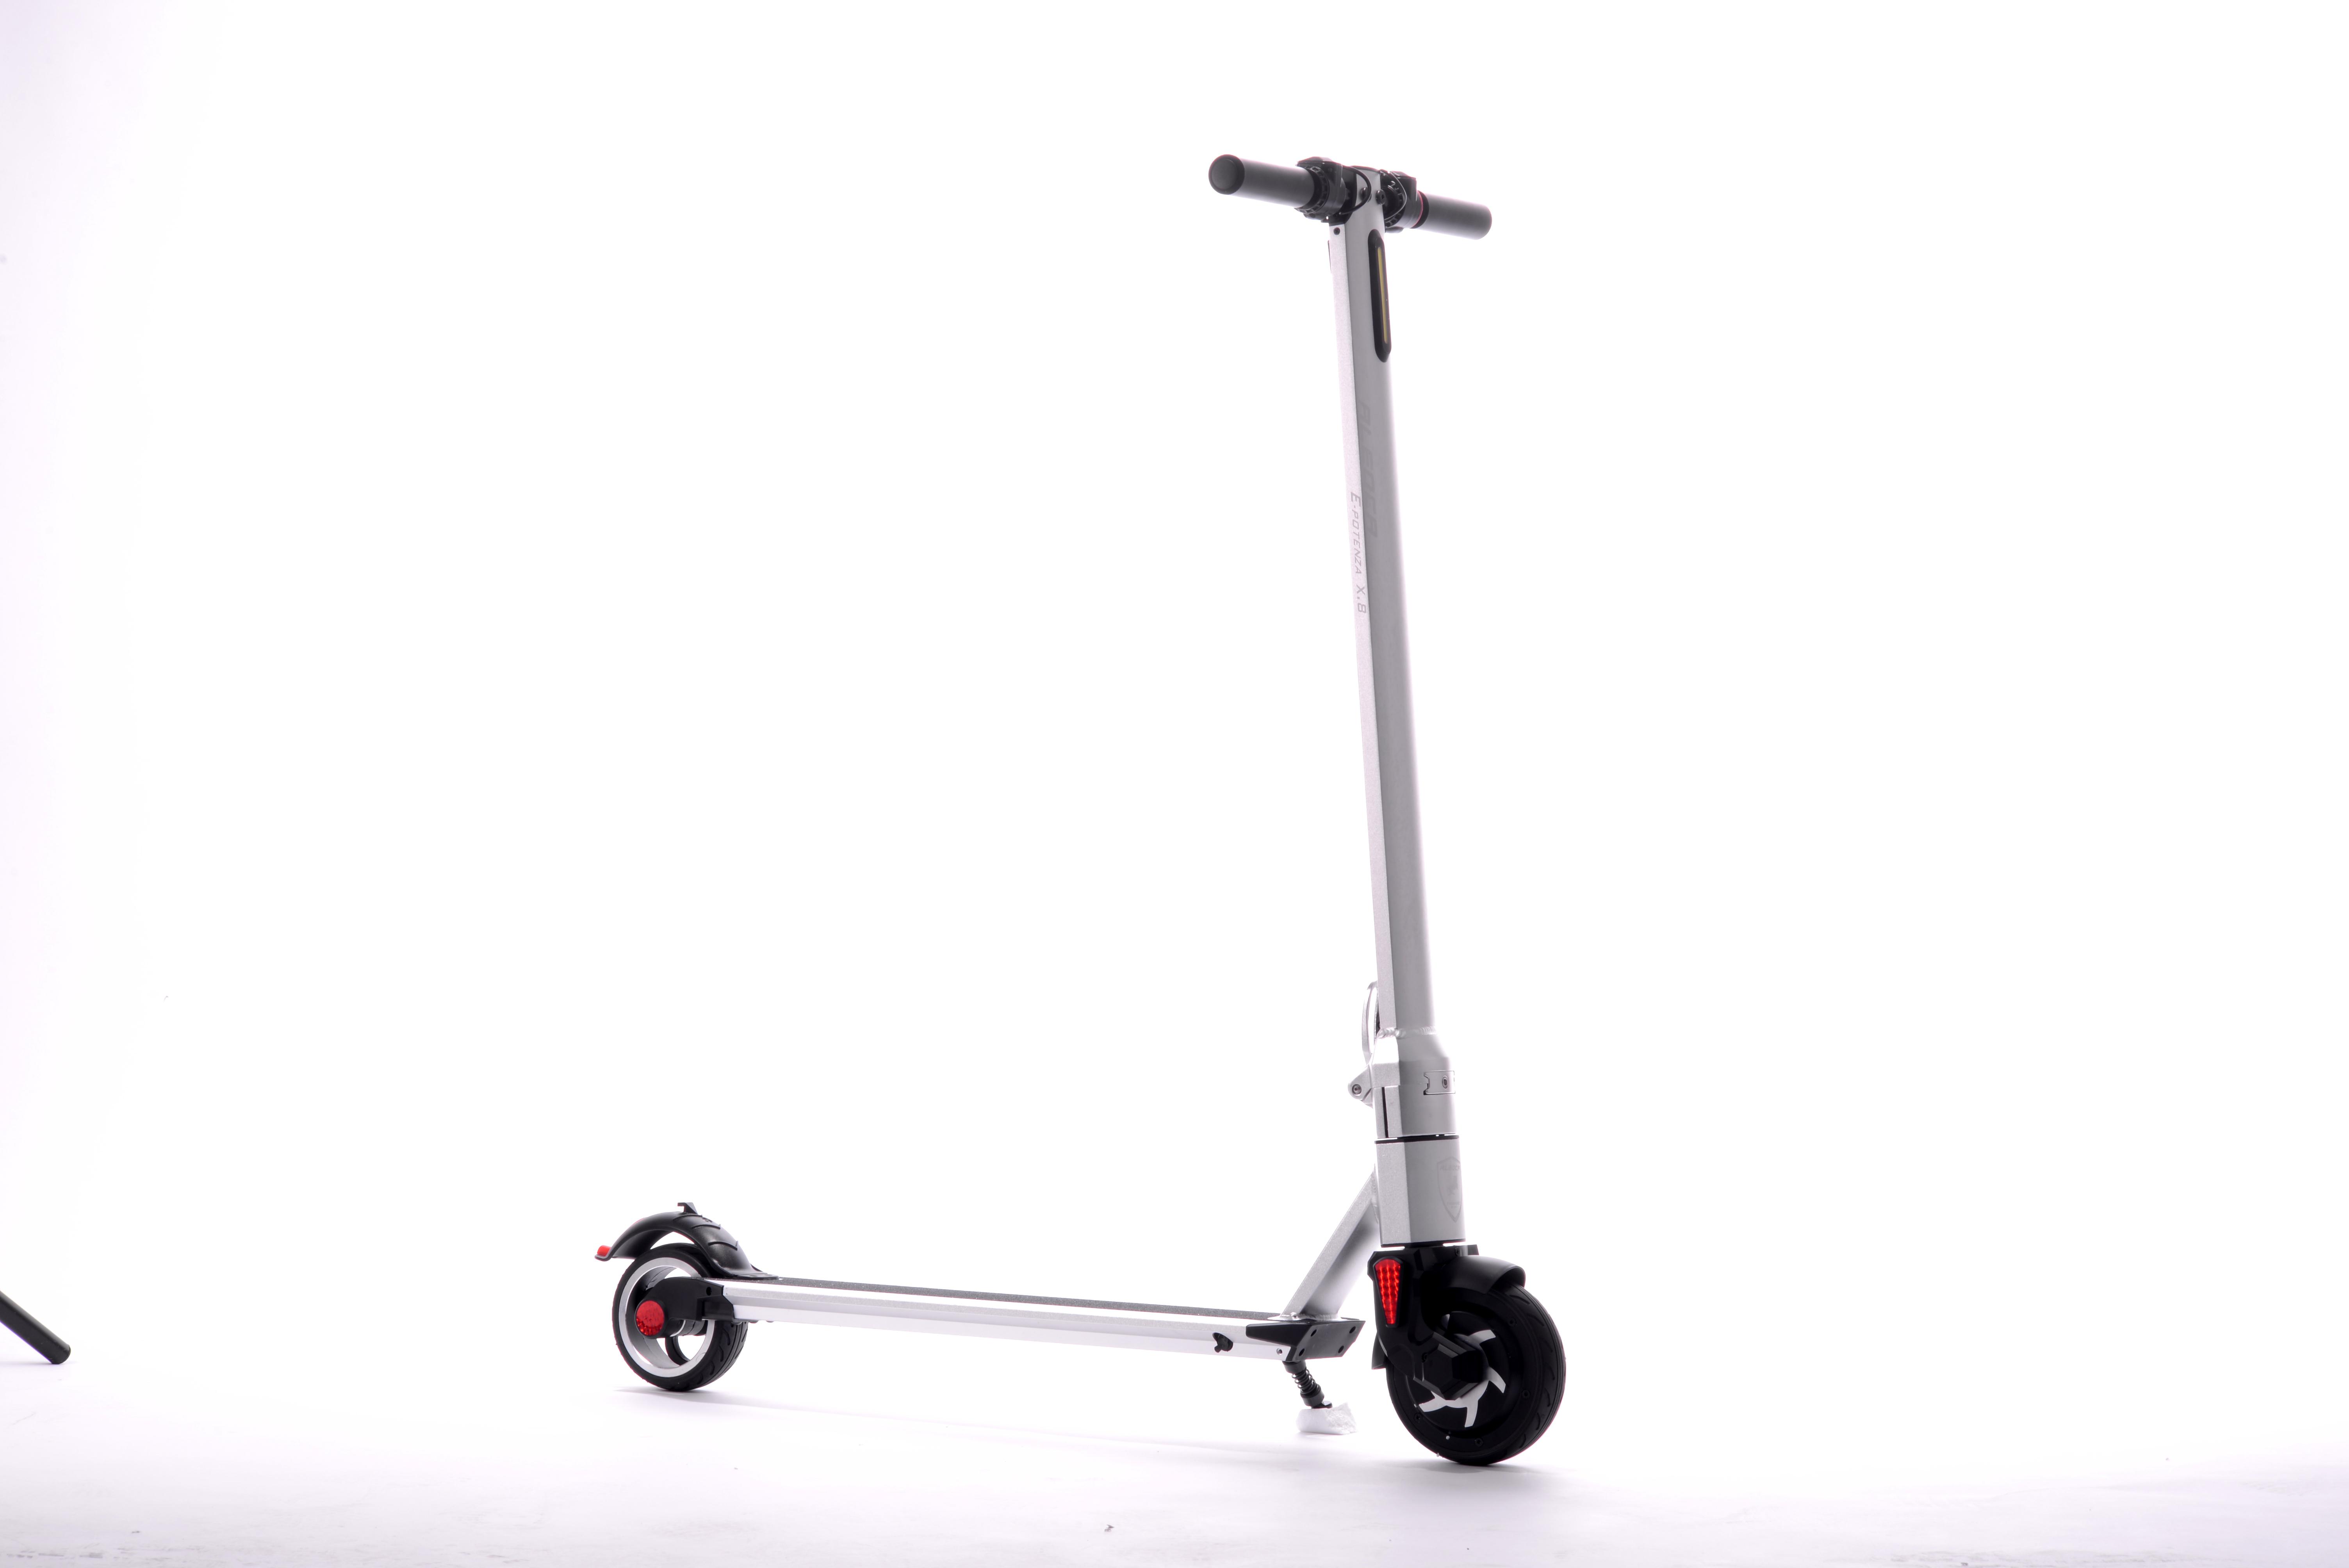 Aleoca E Potenza 6 Alloy Electric Scooter X8 Silver Aleoca